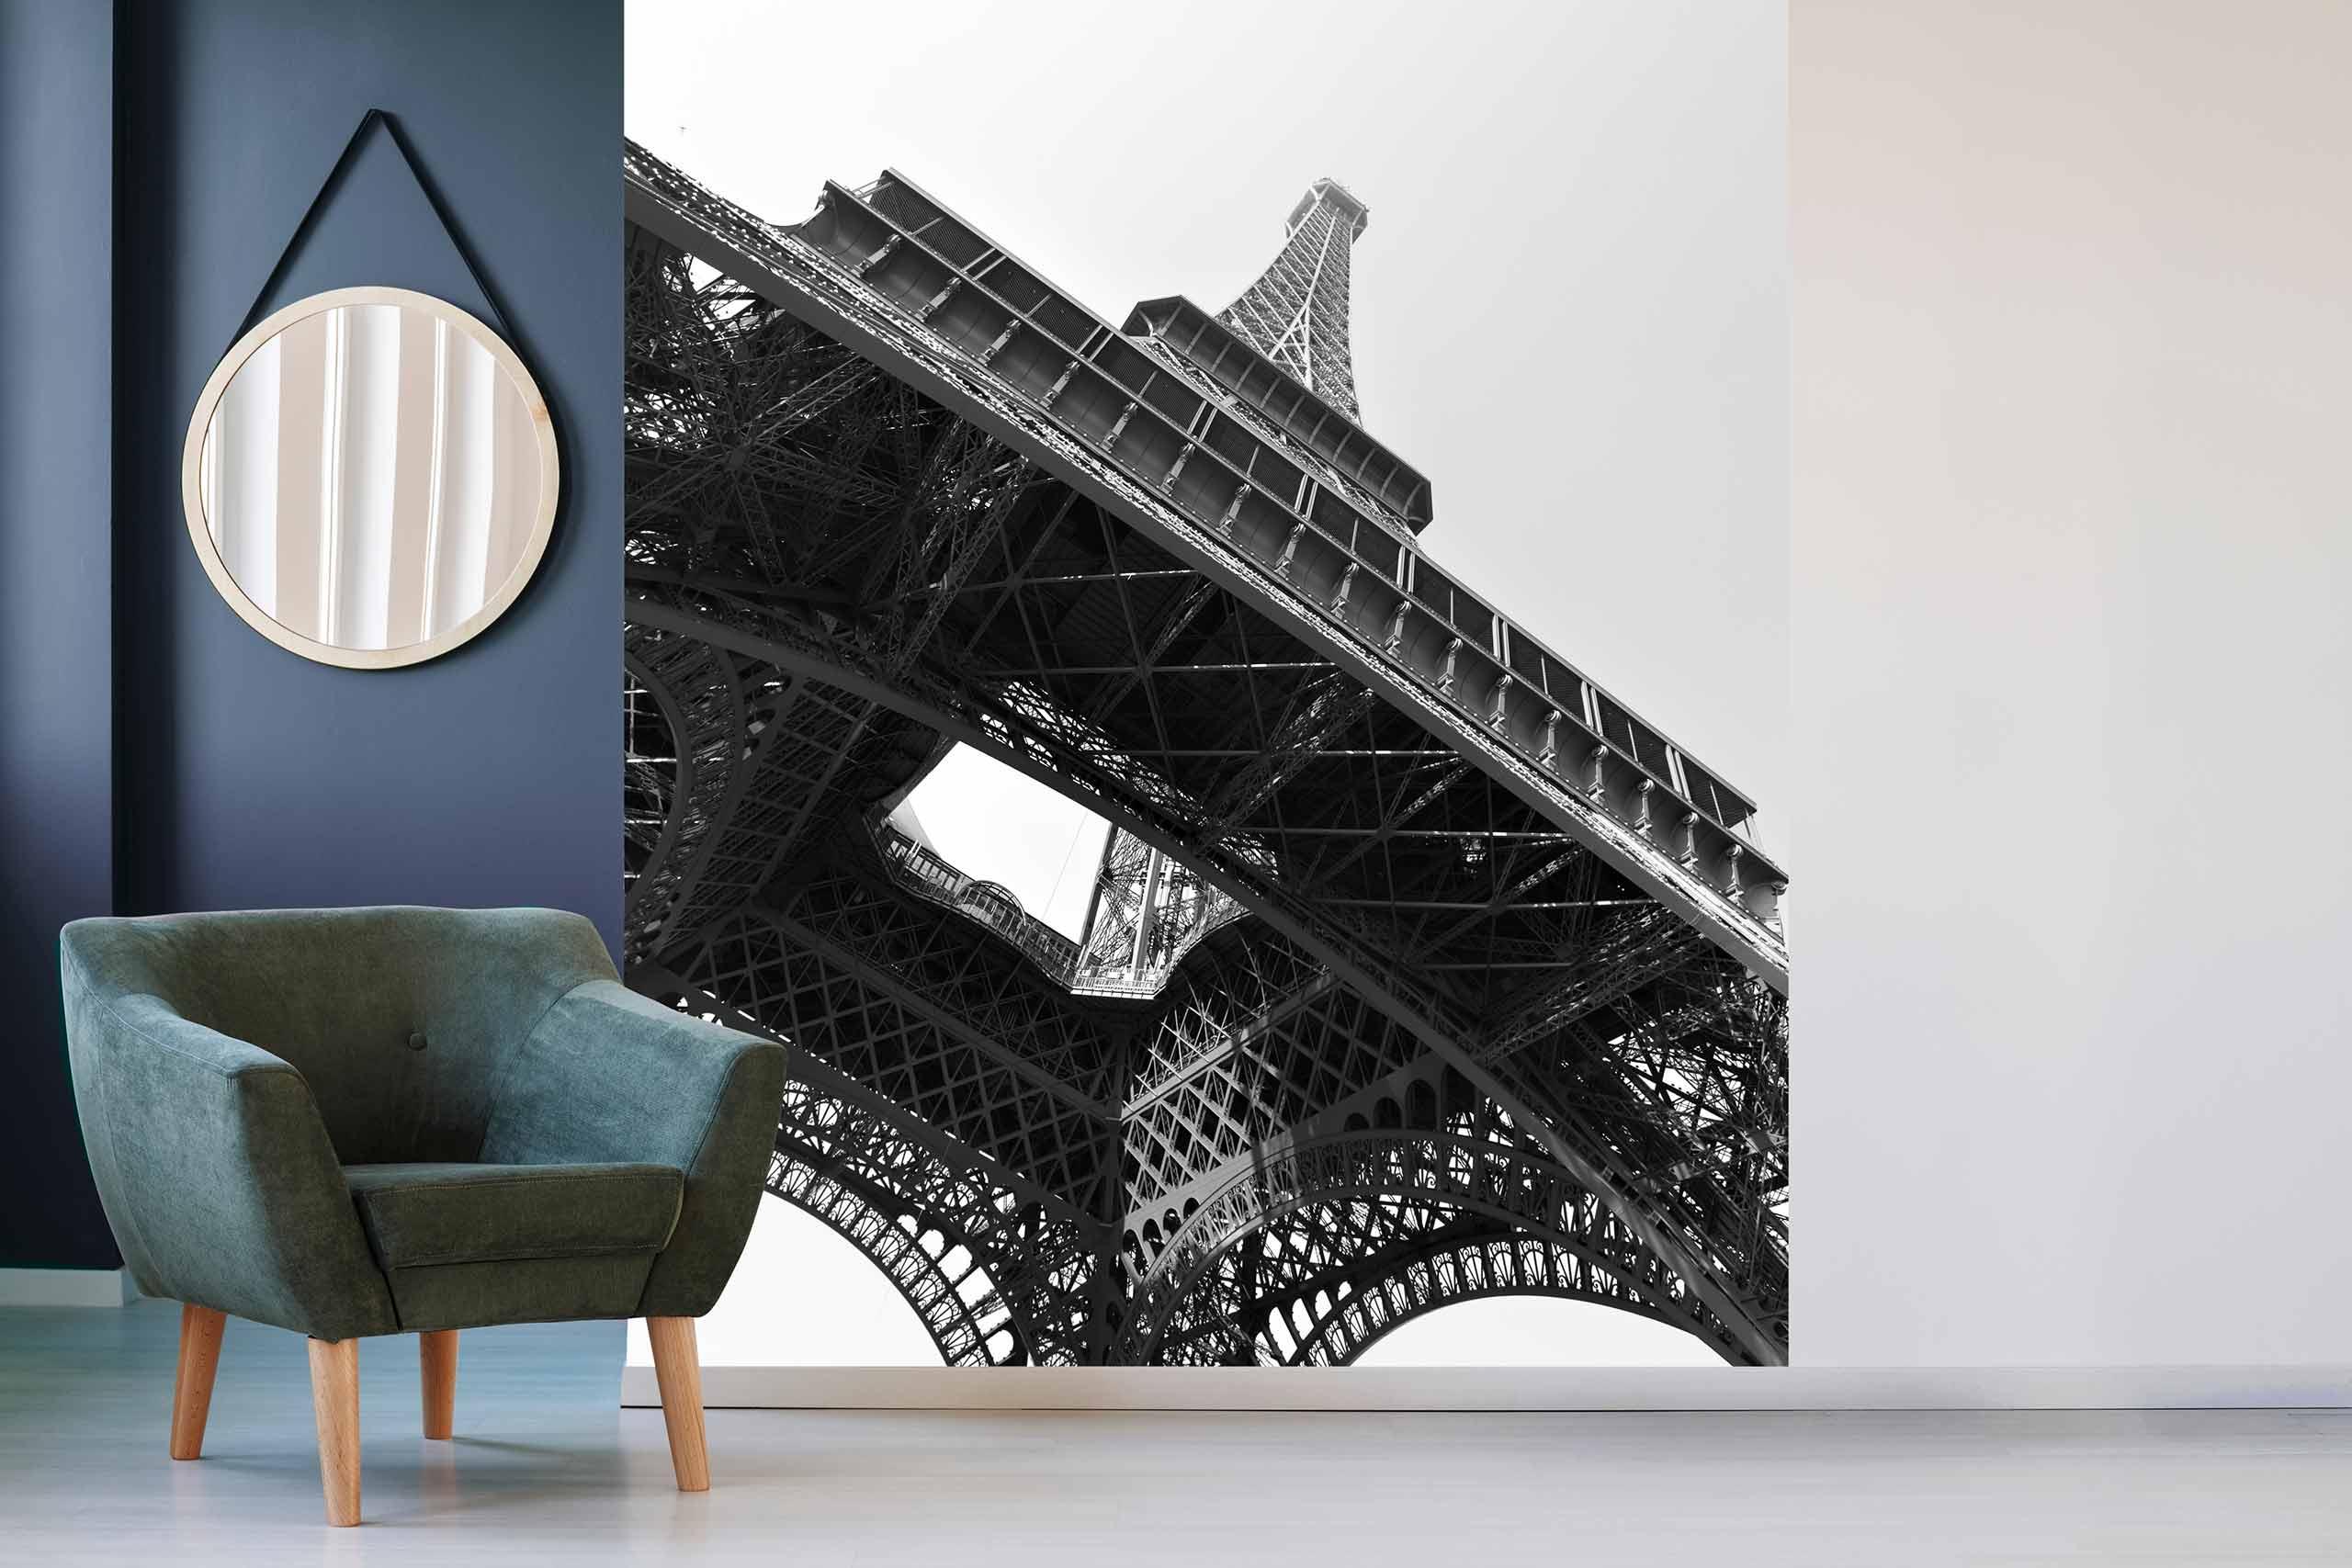 Vlies Tapete 225 Fototapete Höhe 250cm Motiv 06 Paris Eifelturm